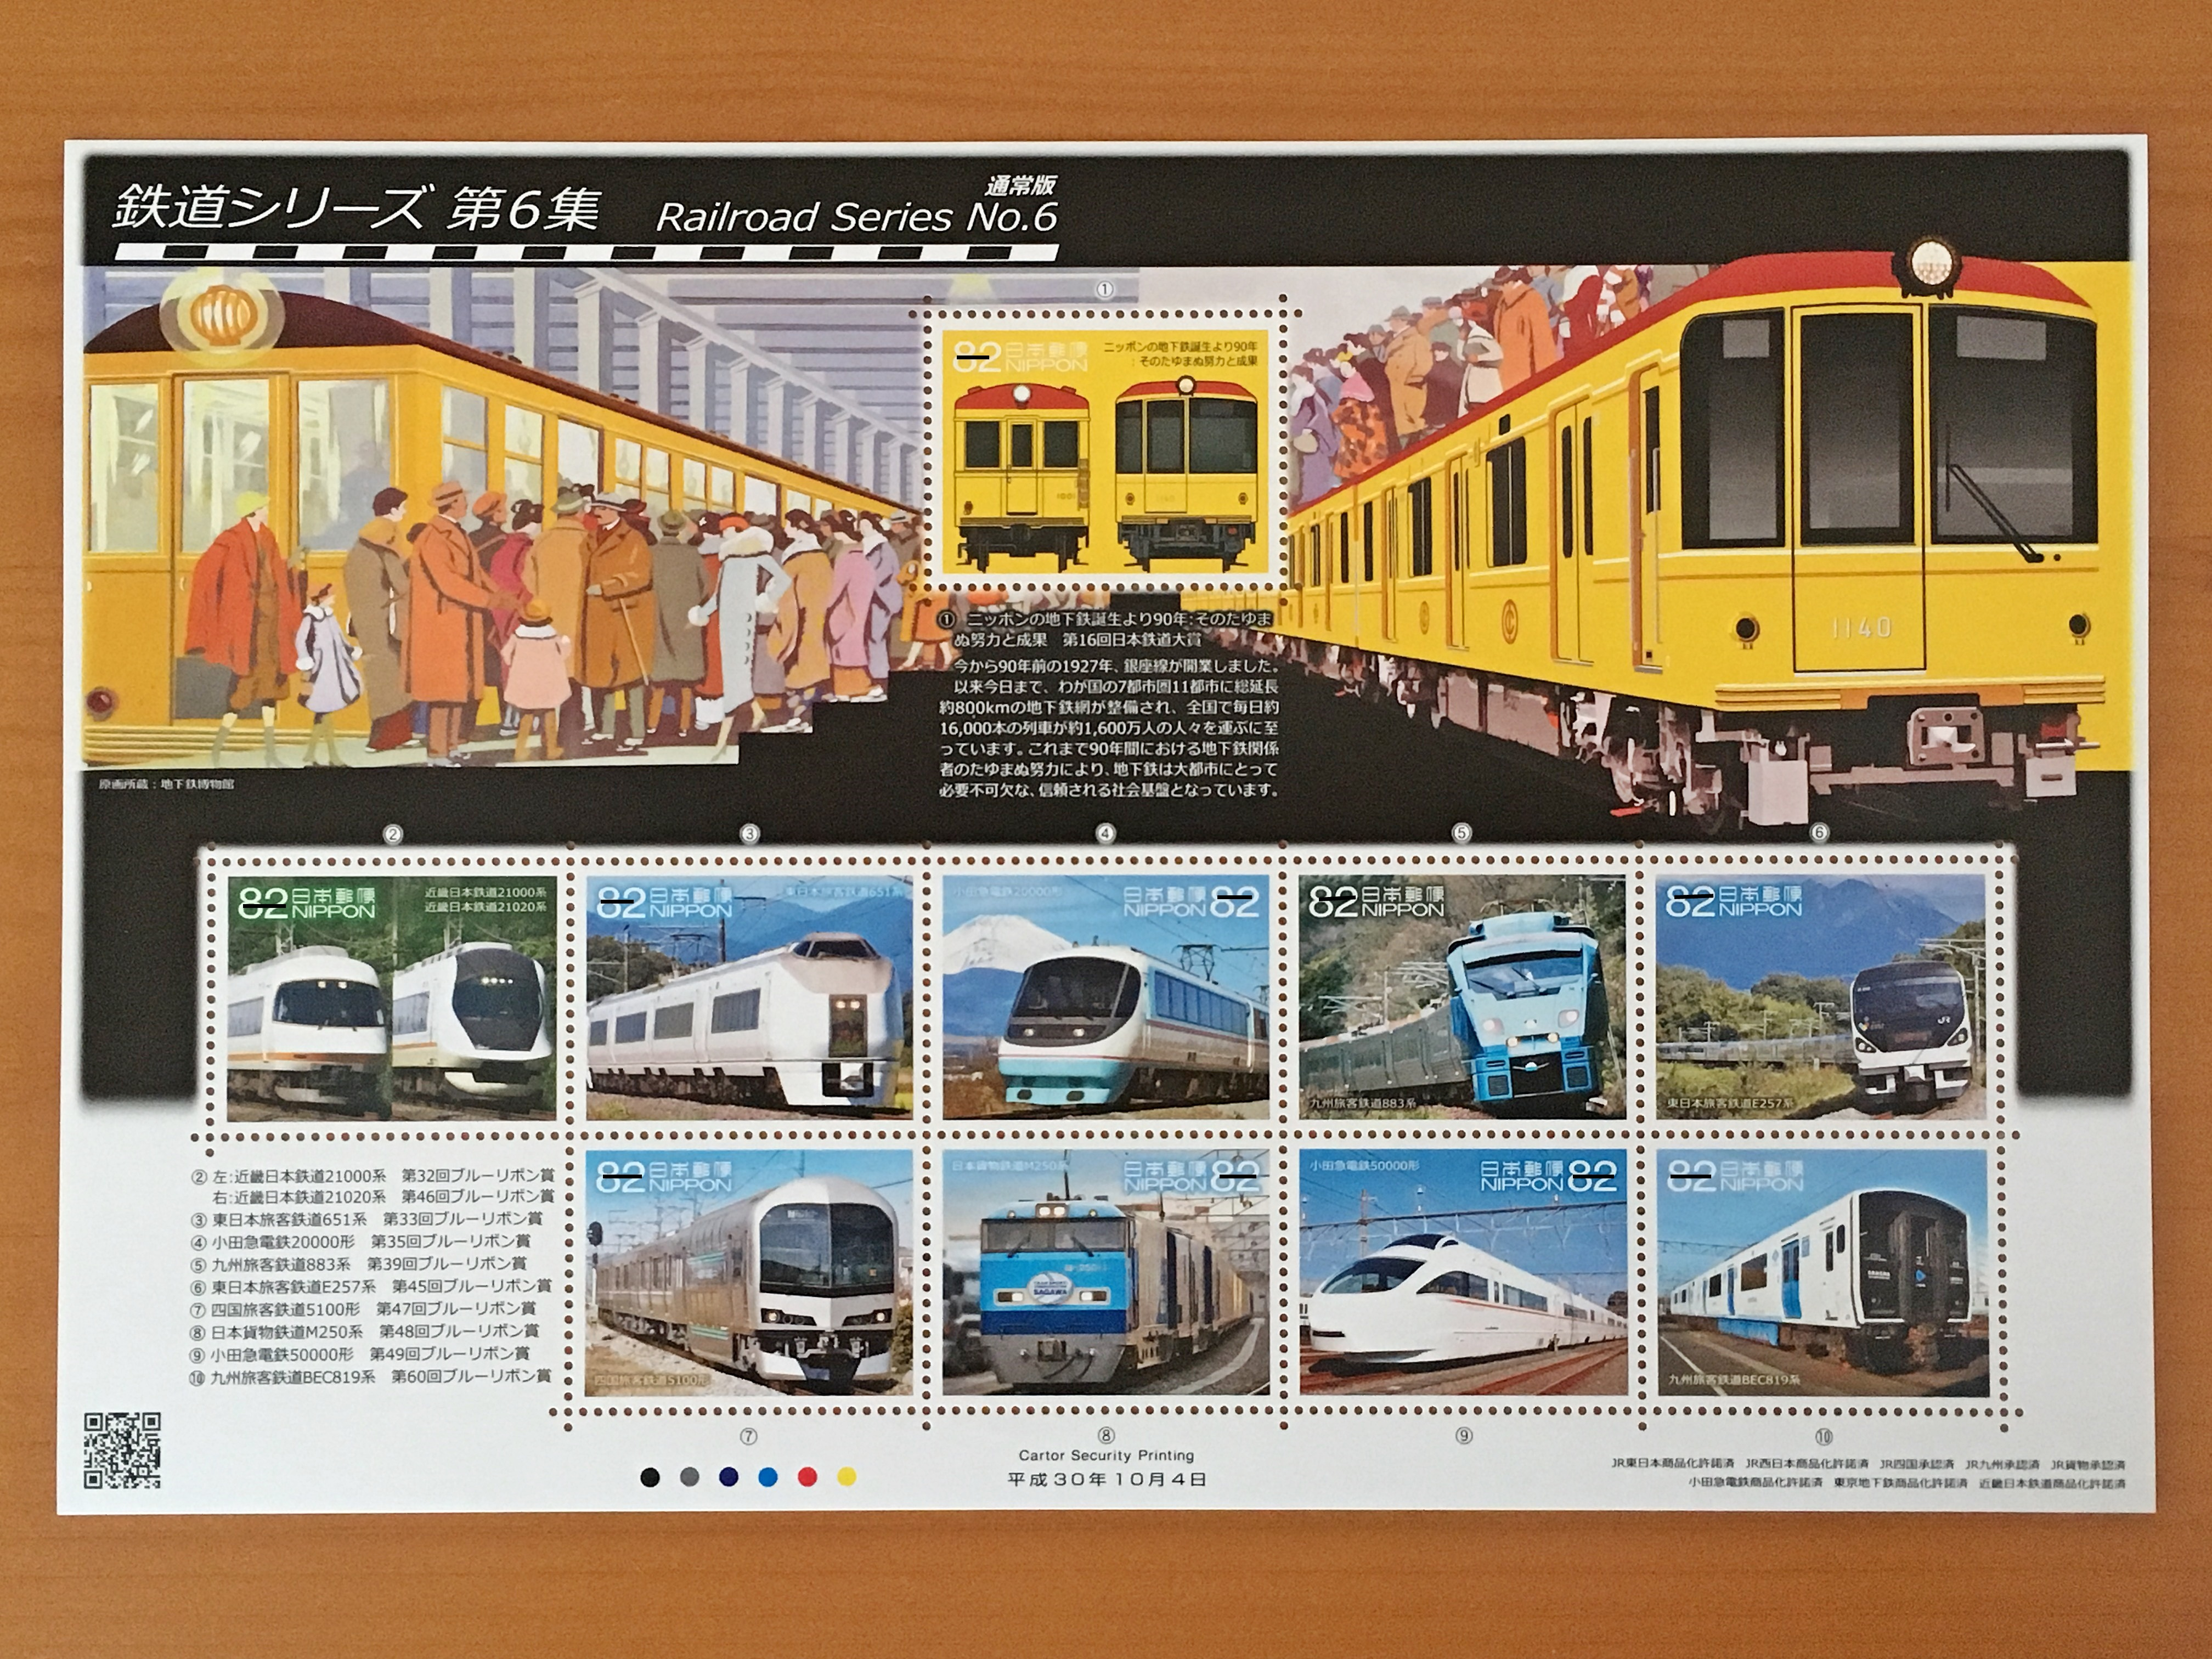 鉄道シリーズ第6集 通常版.JPG